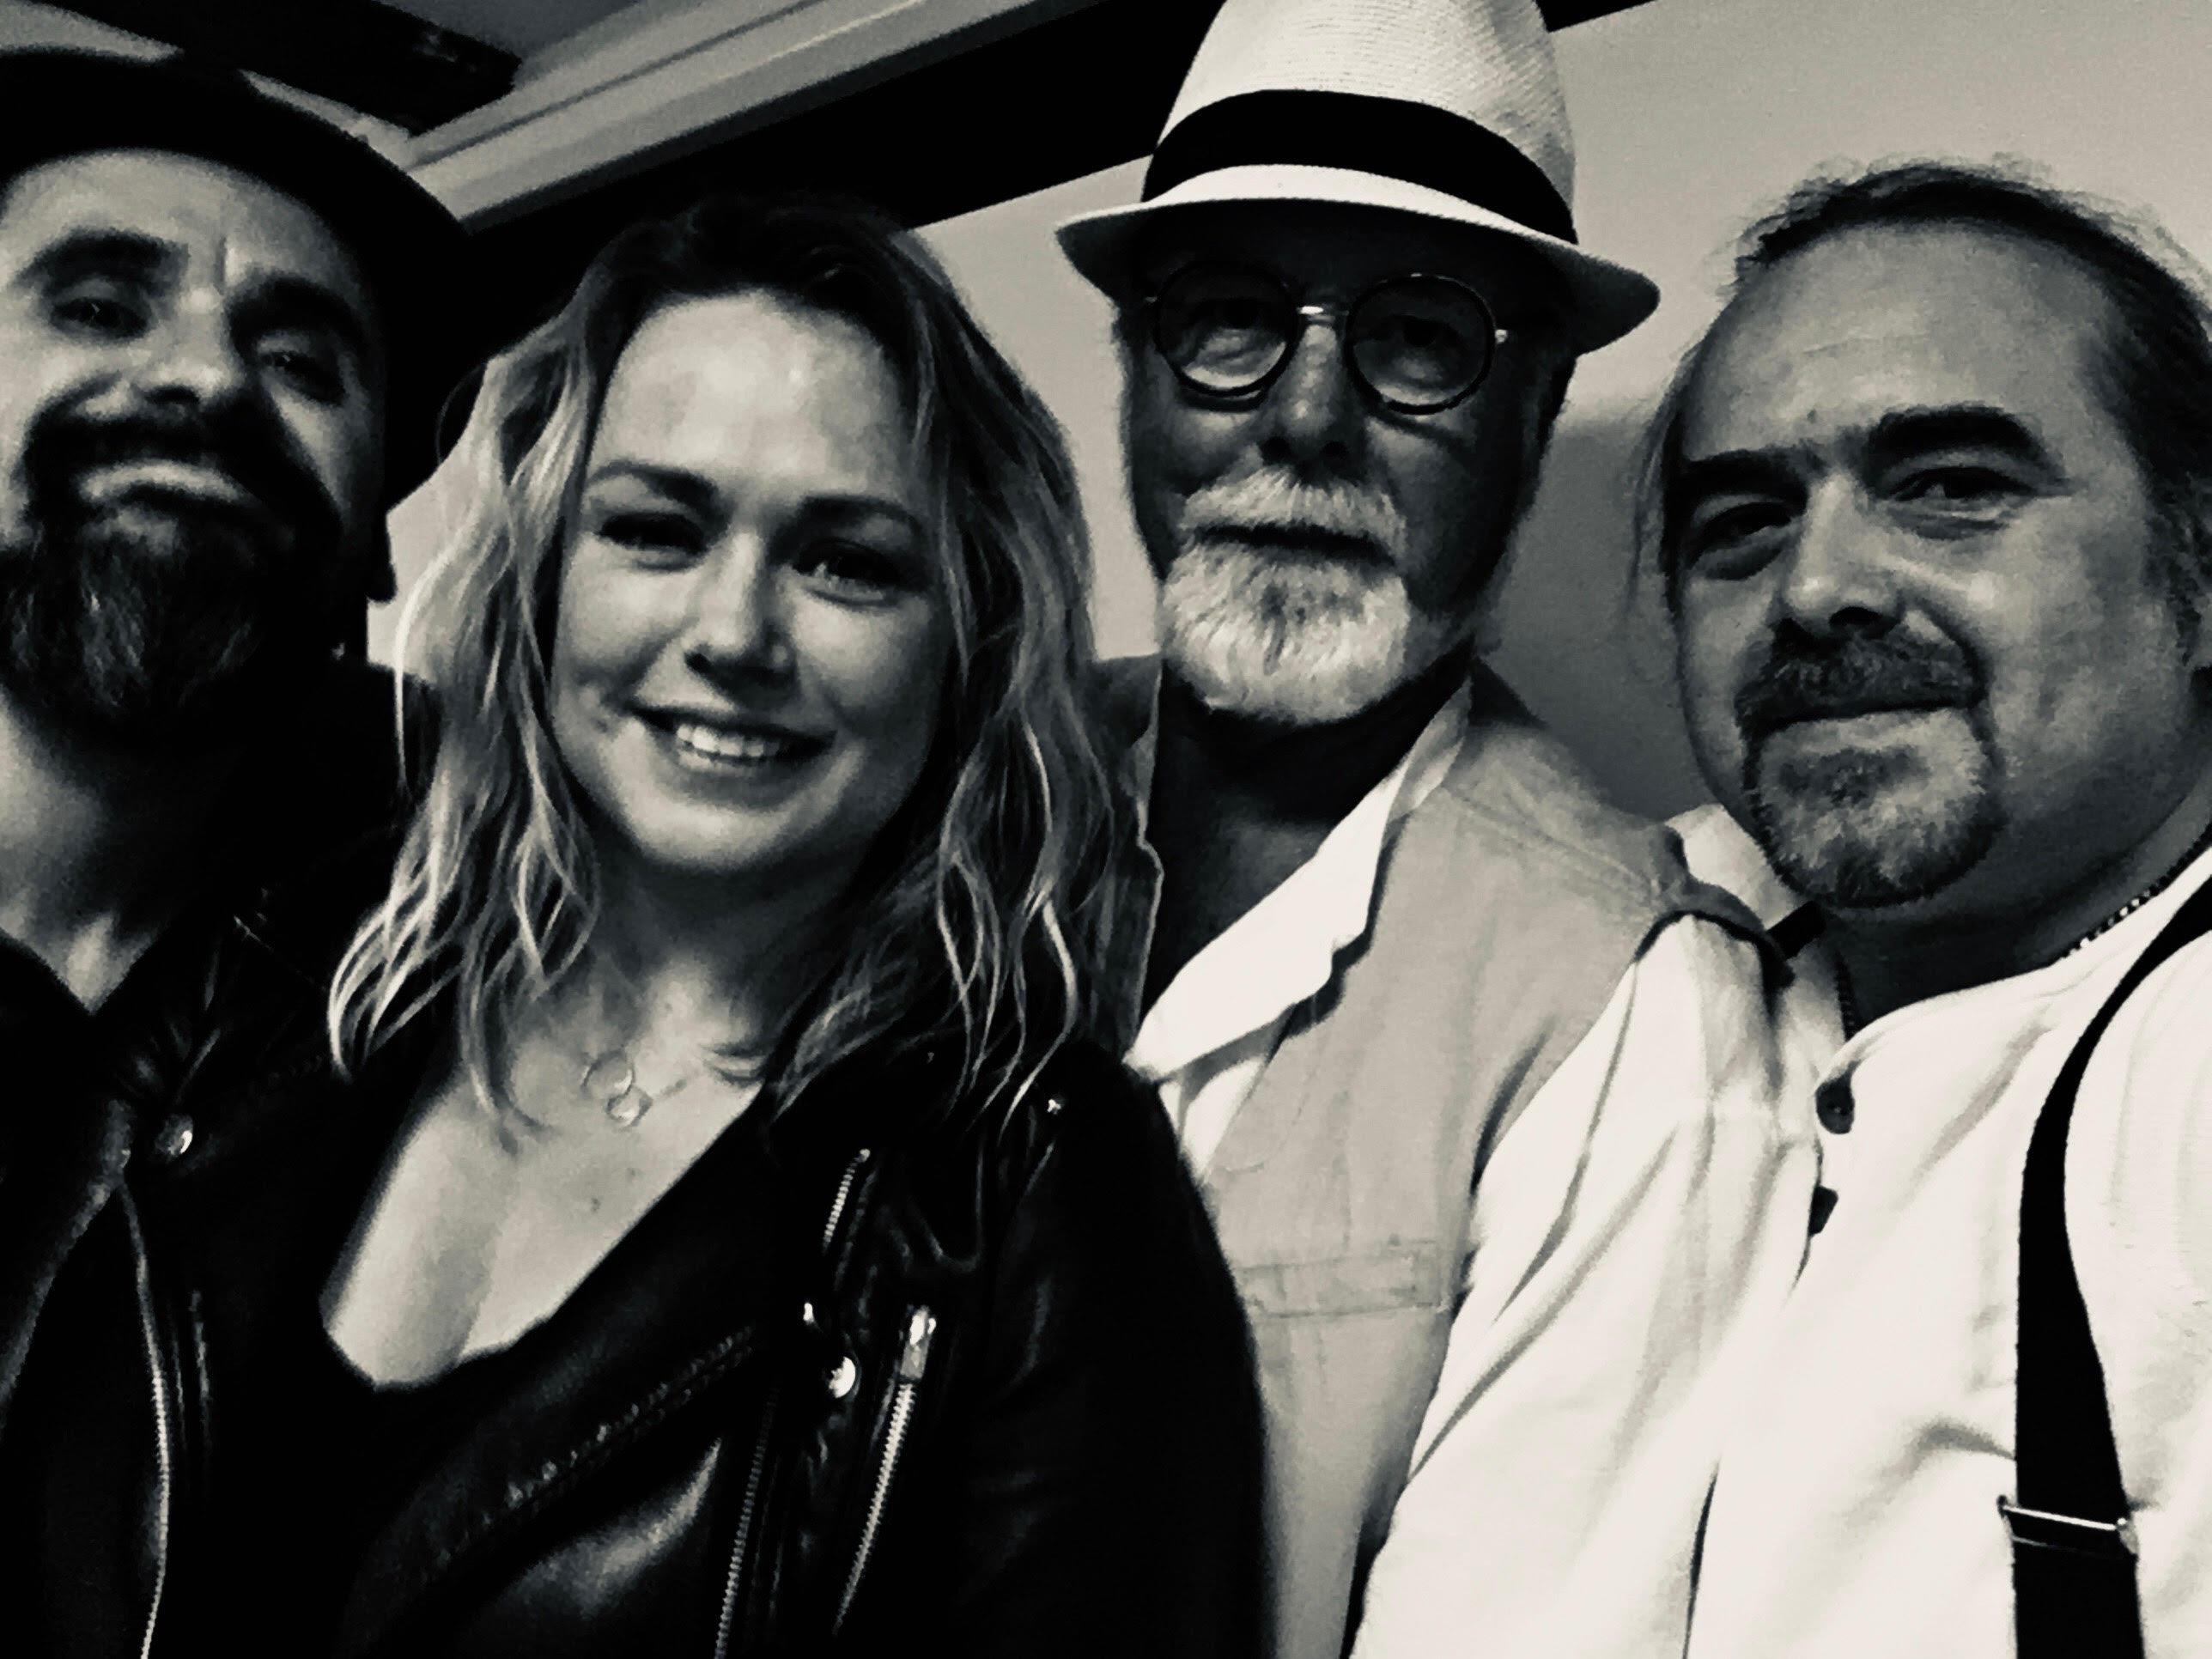 Karin Rudefelt & Doctor Blues - bandbild 2020. Photographer: Egentagen bild